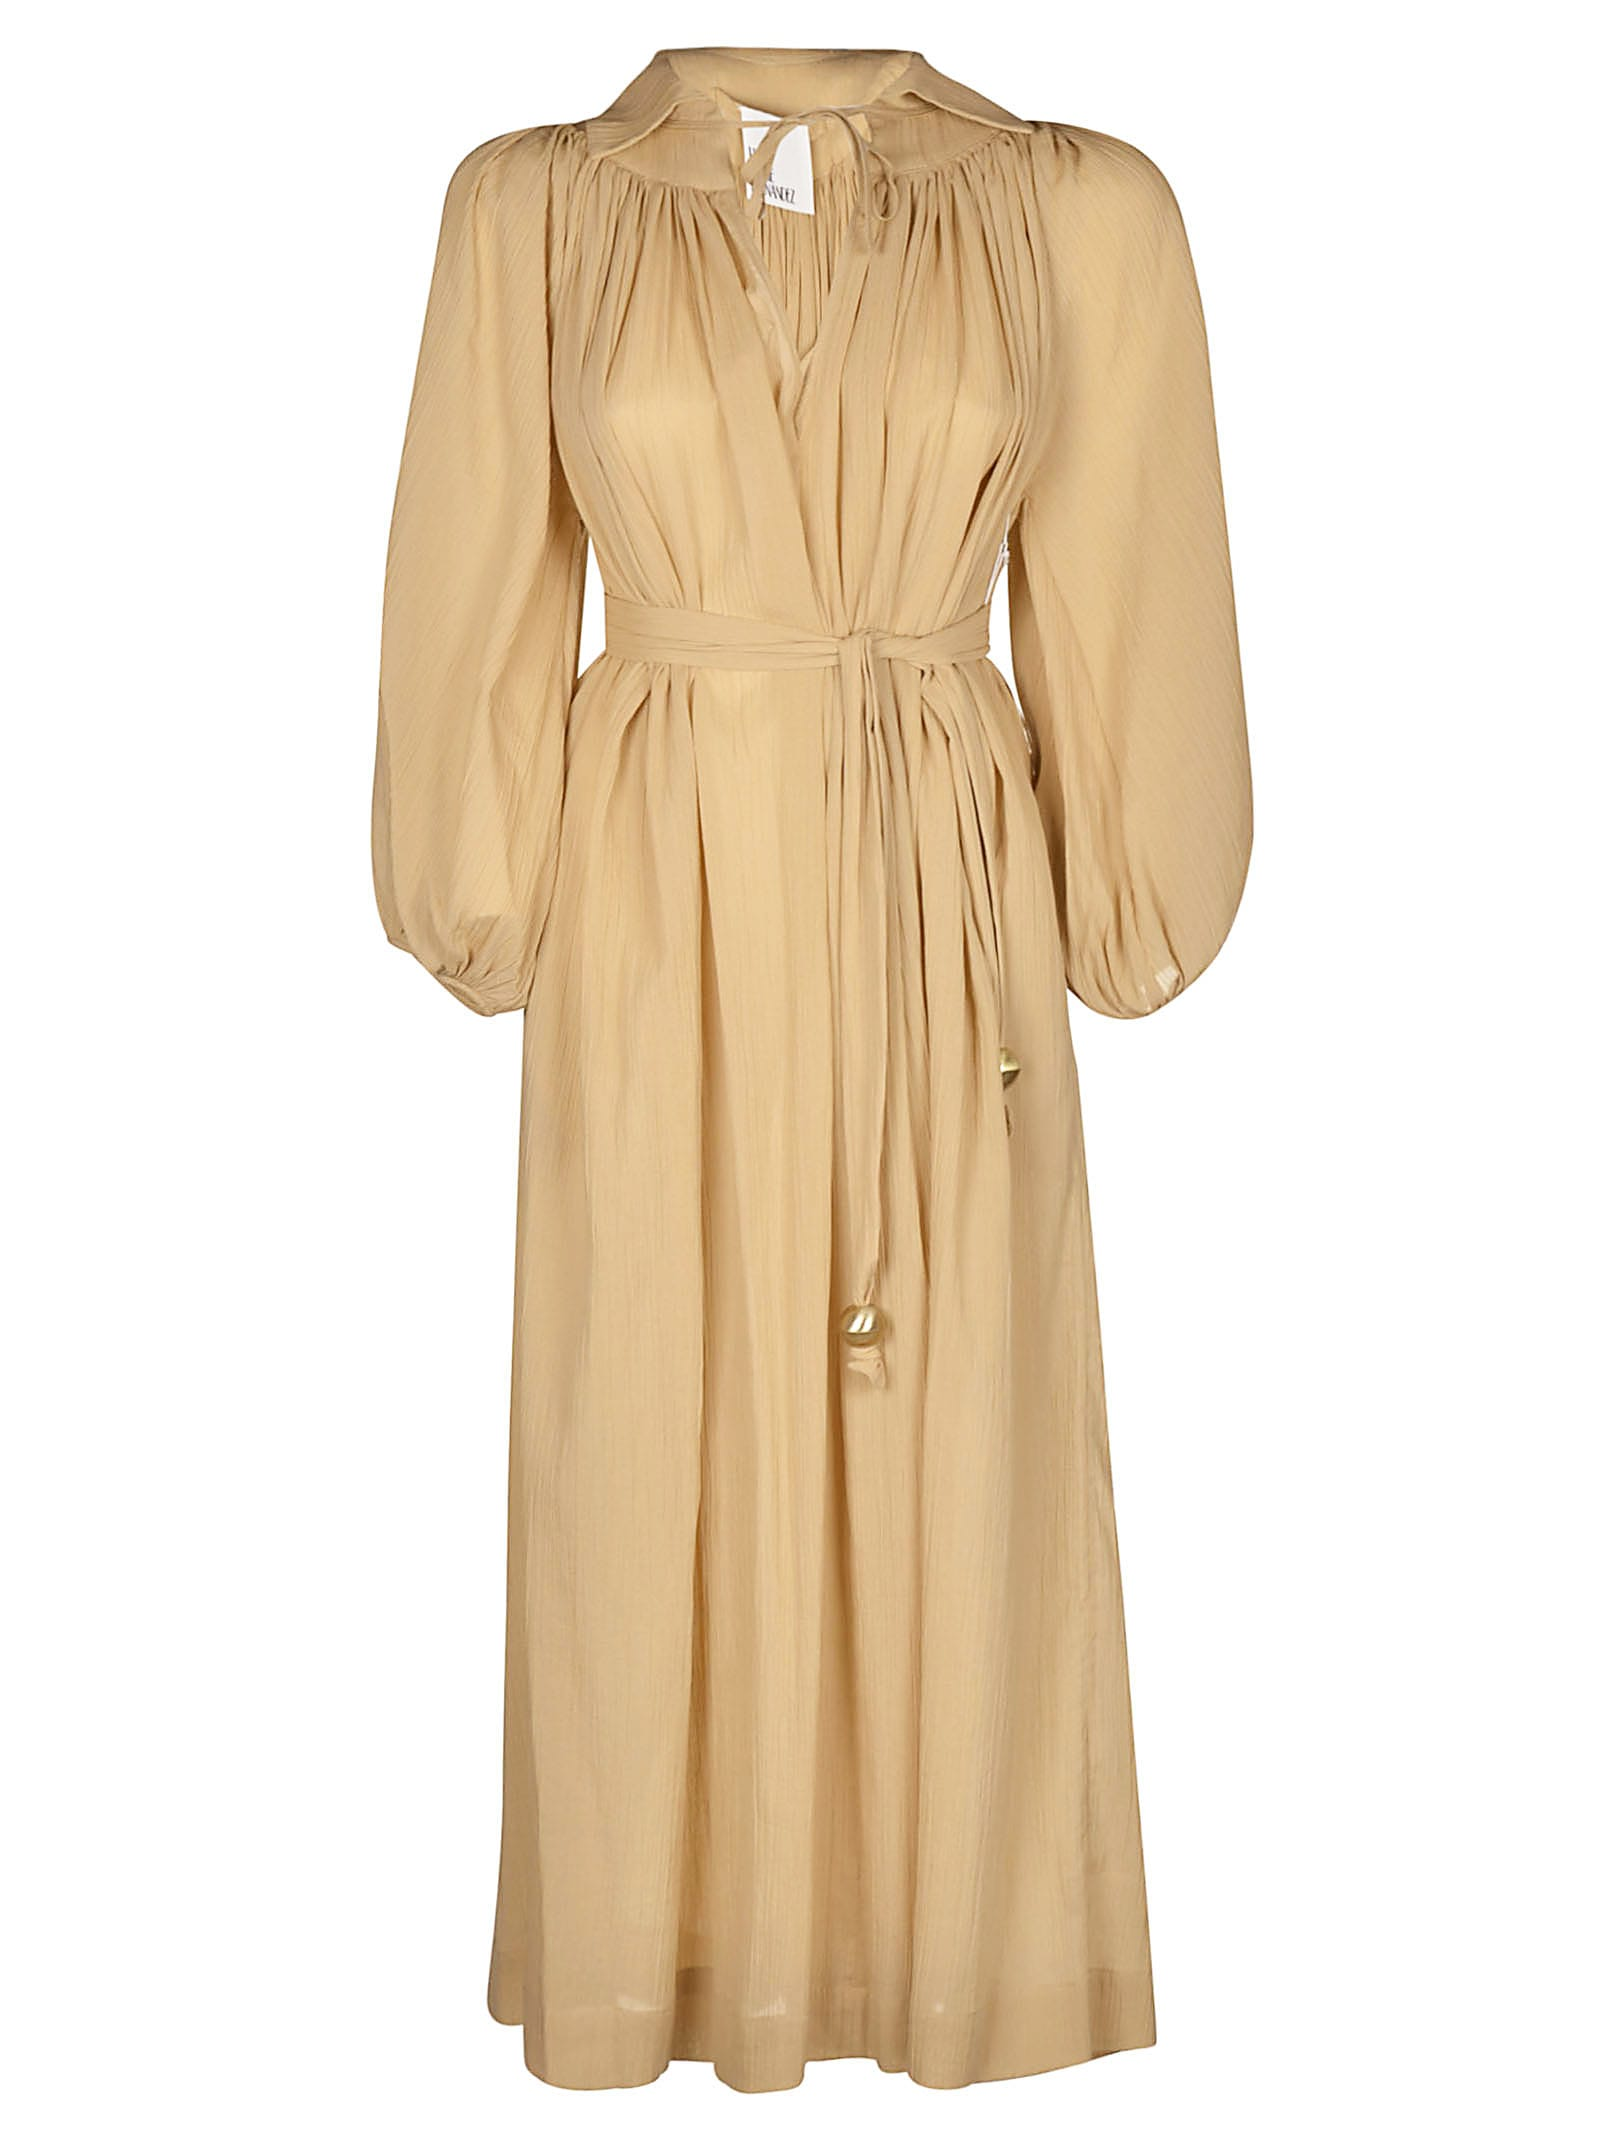 Lisa Marie Fernandez Collared Maxi Dress